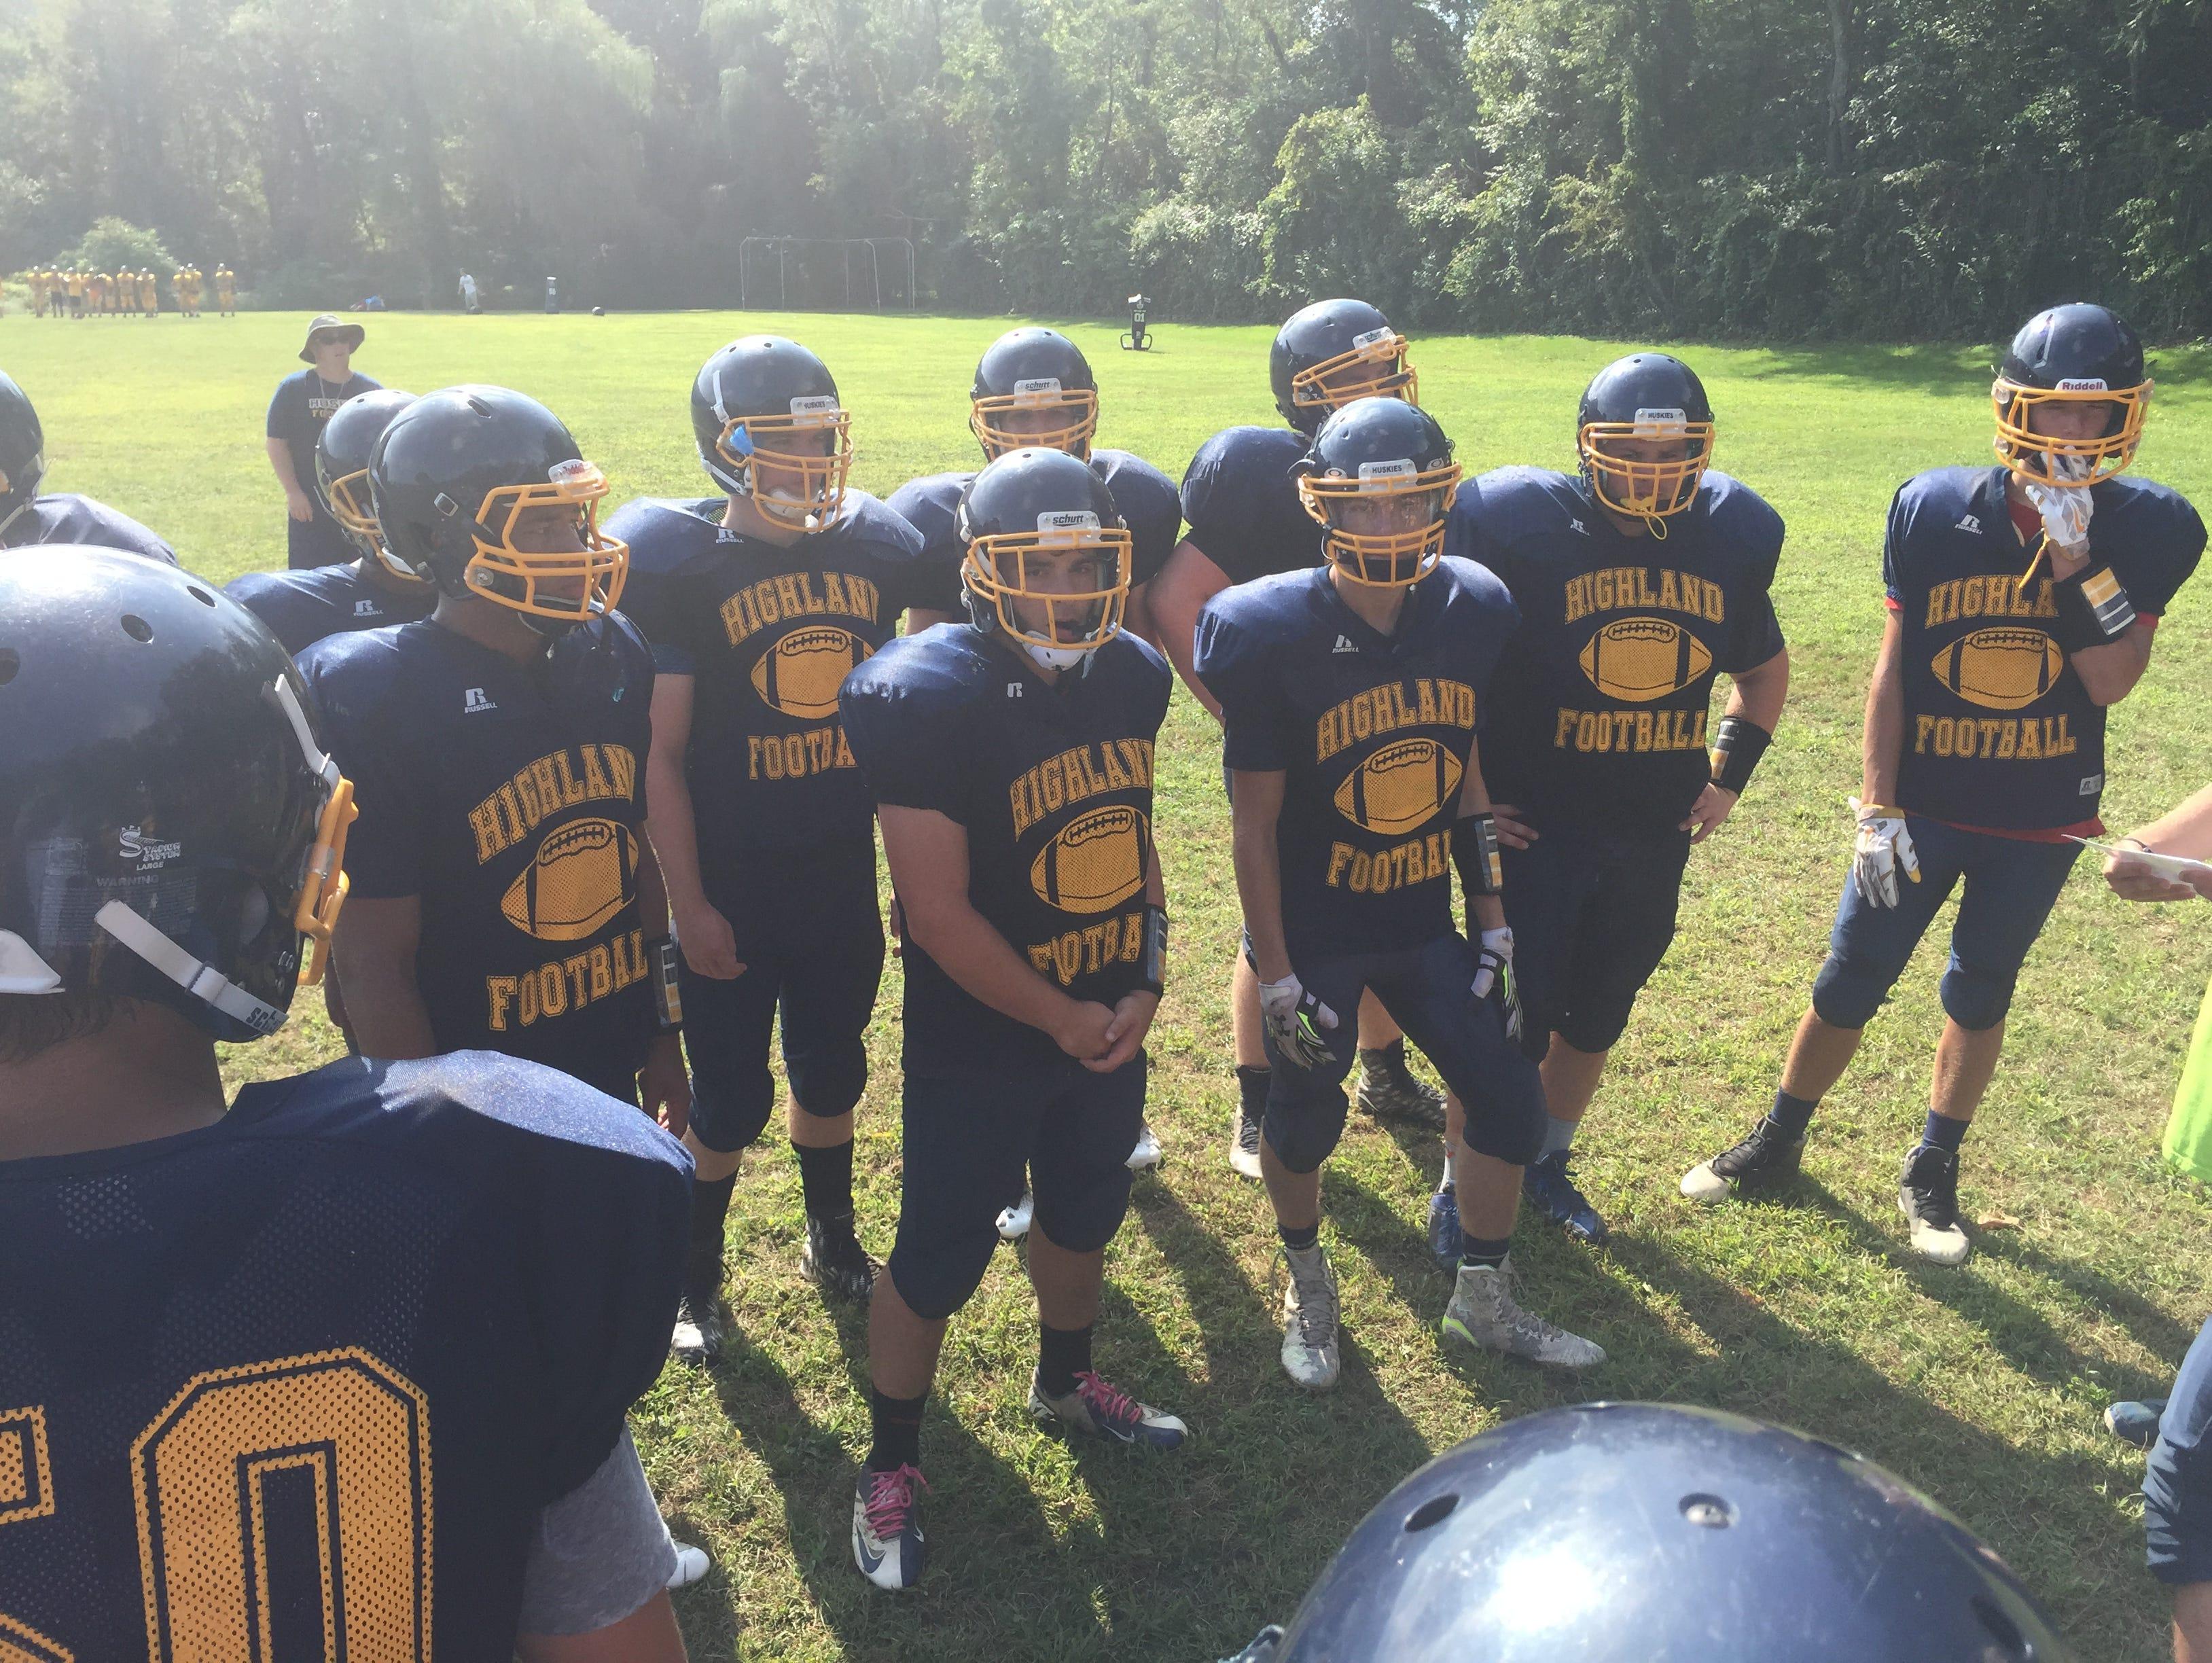 The Highland High School football team huddles during practice on Aug. 26, 2016.